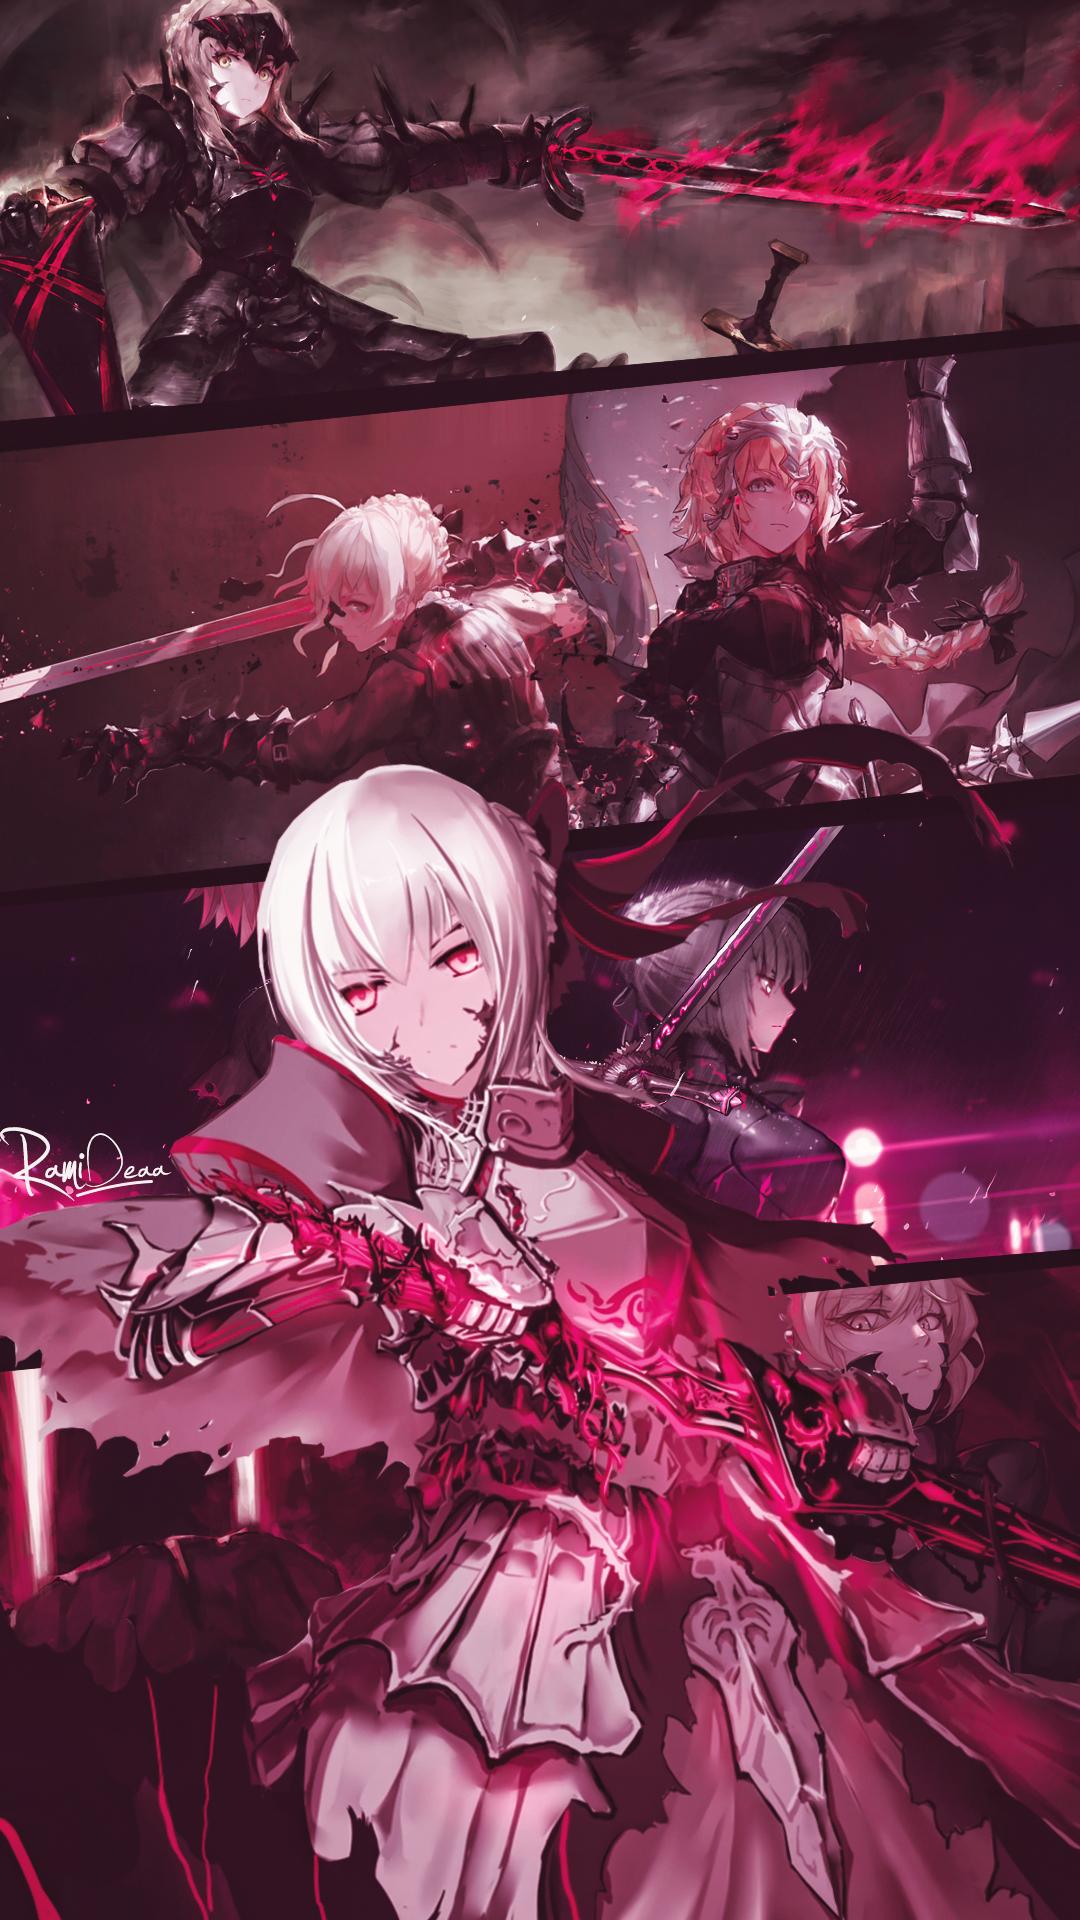 Saber Alter Fate Stay Night Wallpaper De Anime Arte De